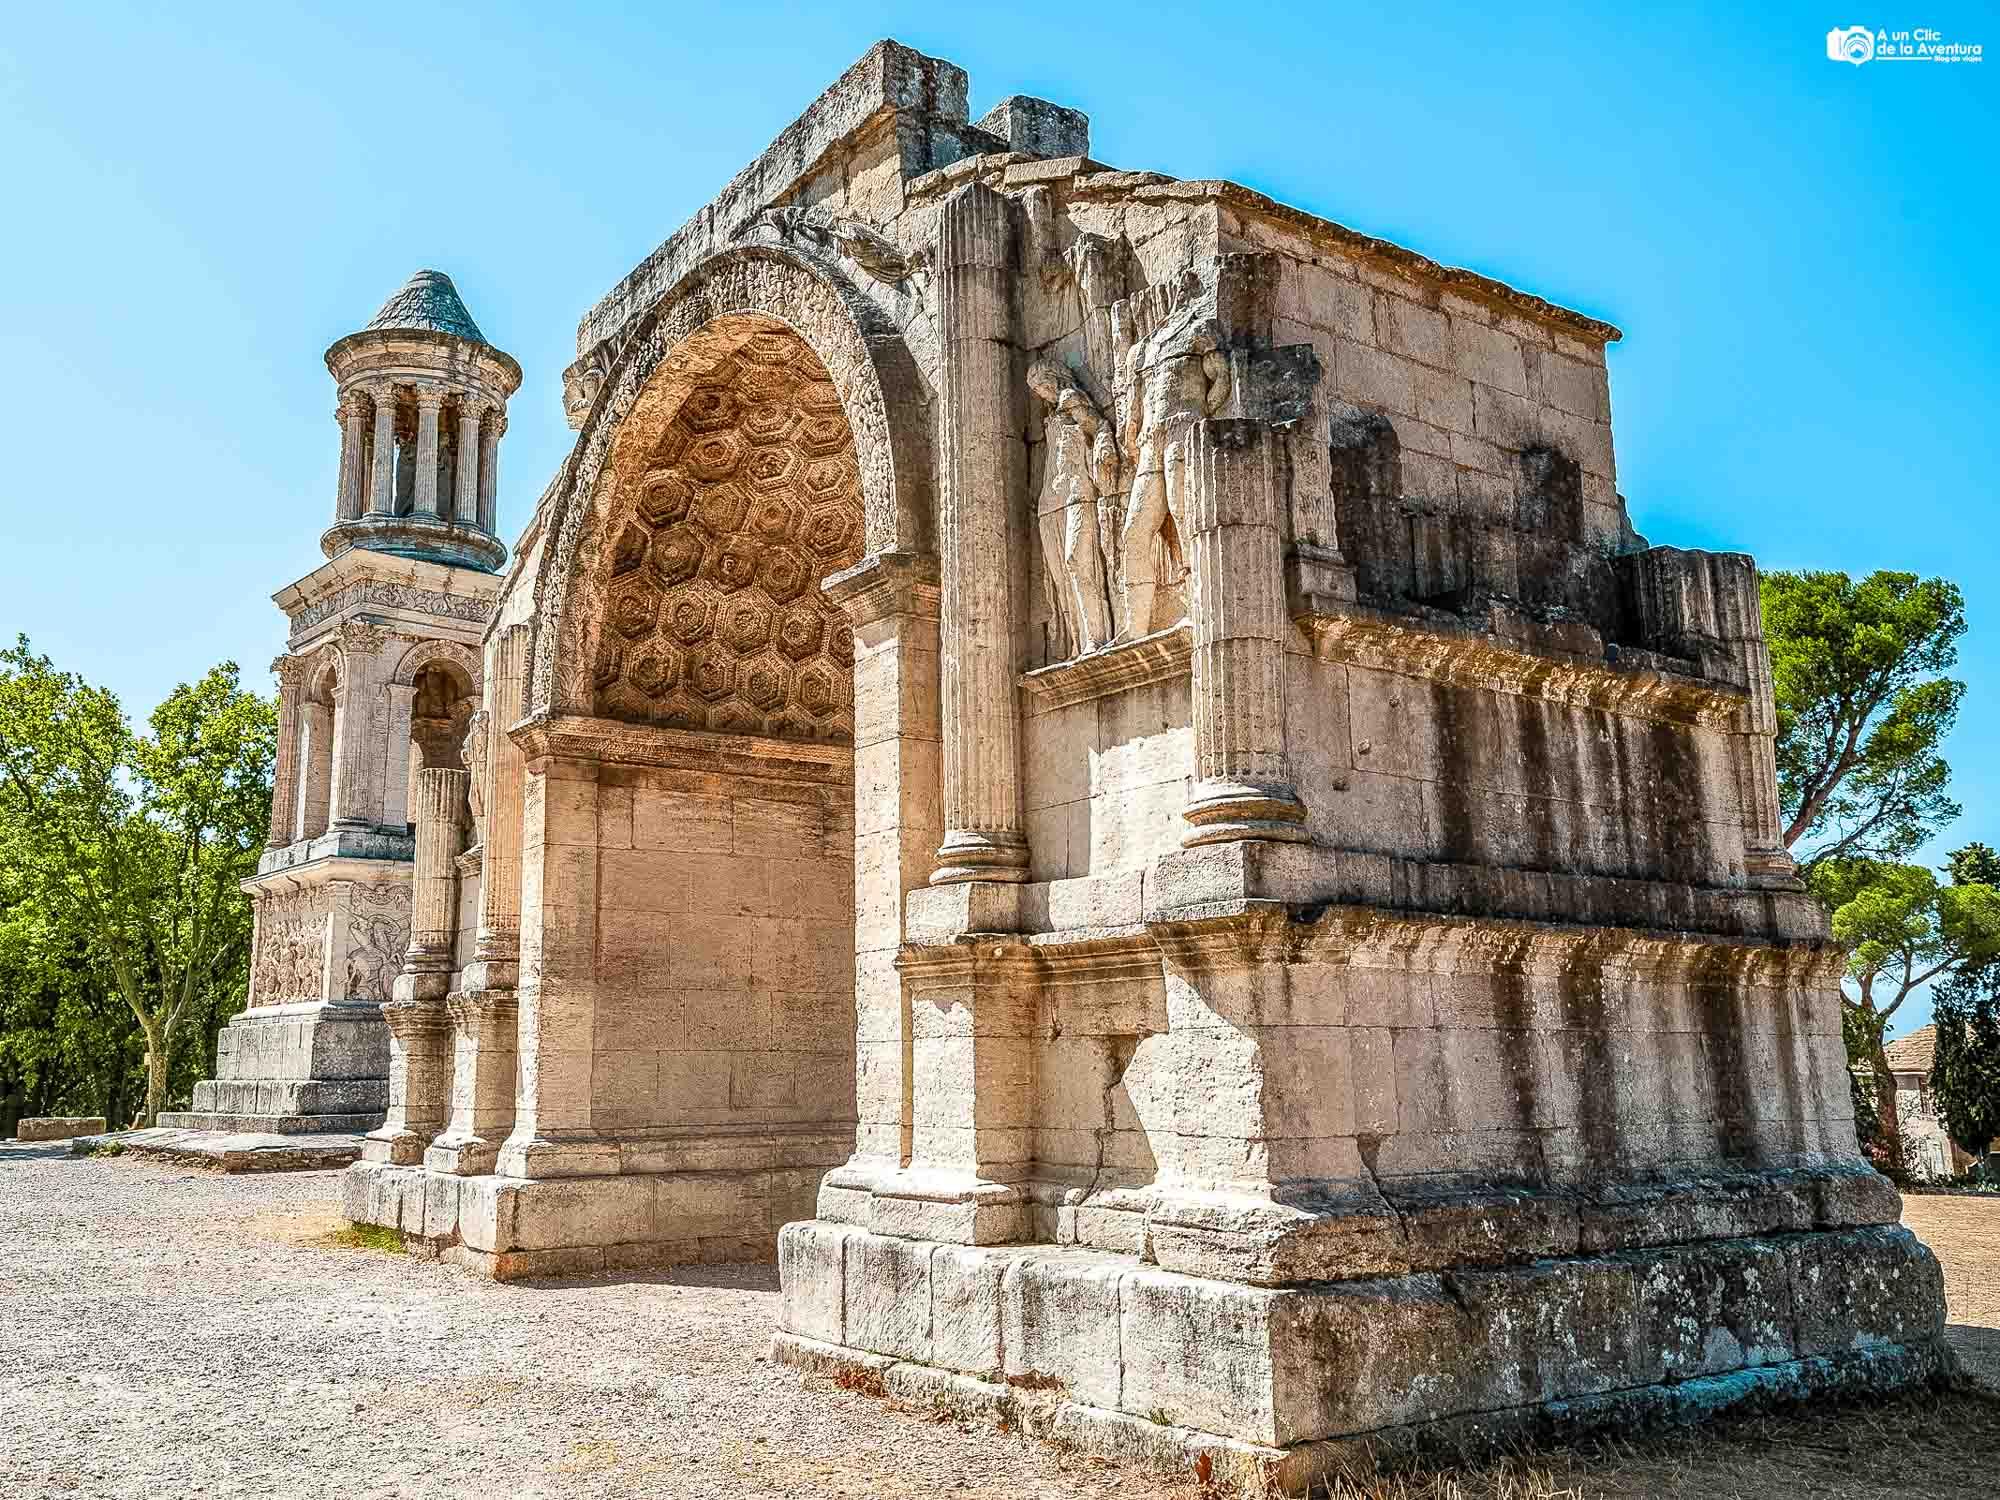 Ciudad romana de Glanum